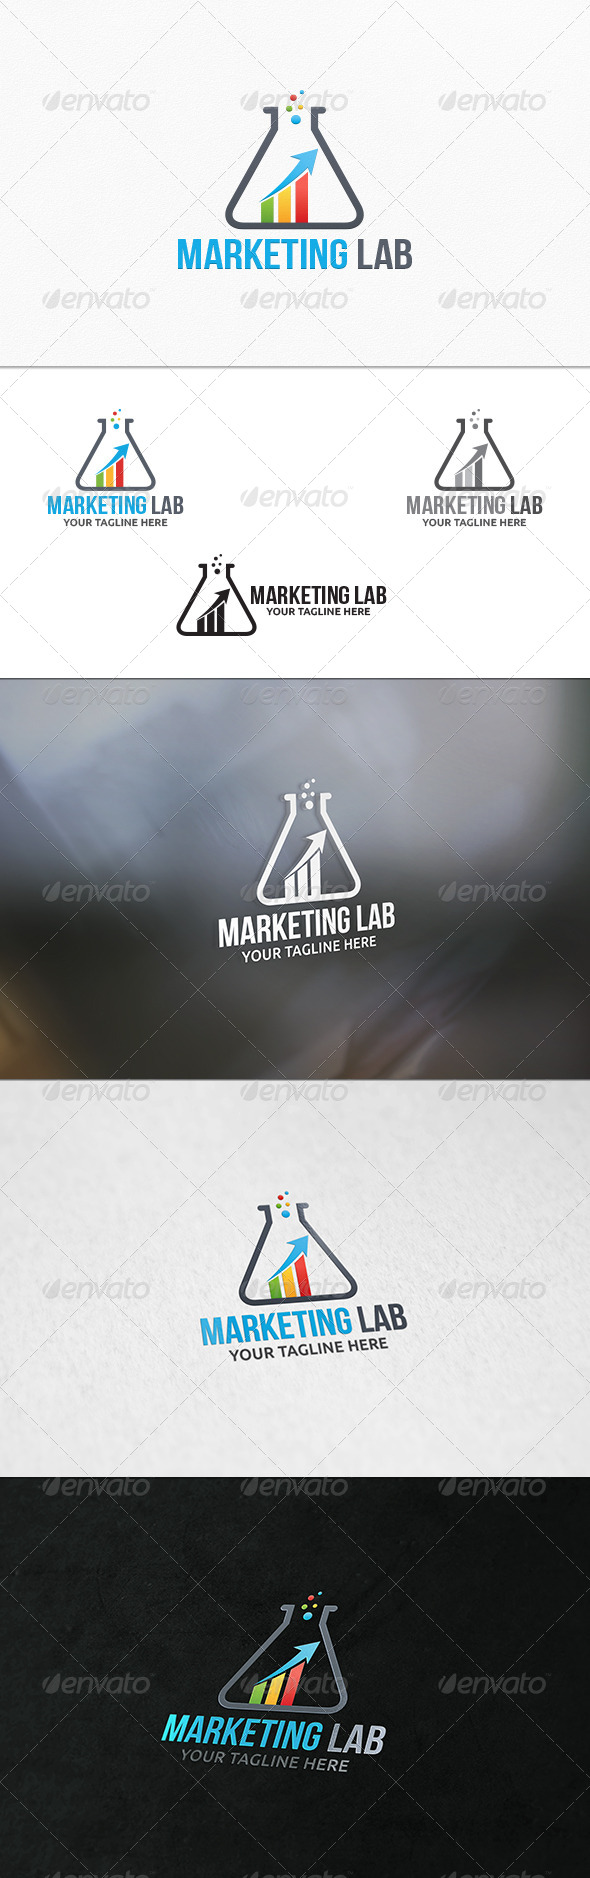 GraphicRiver Marketing Lab Logo Template 7742730